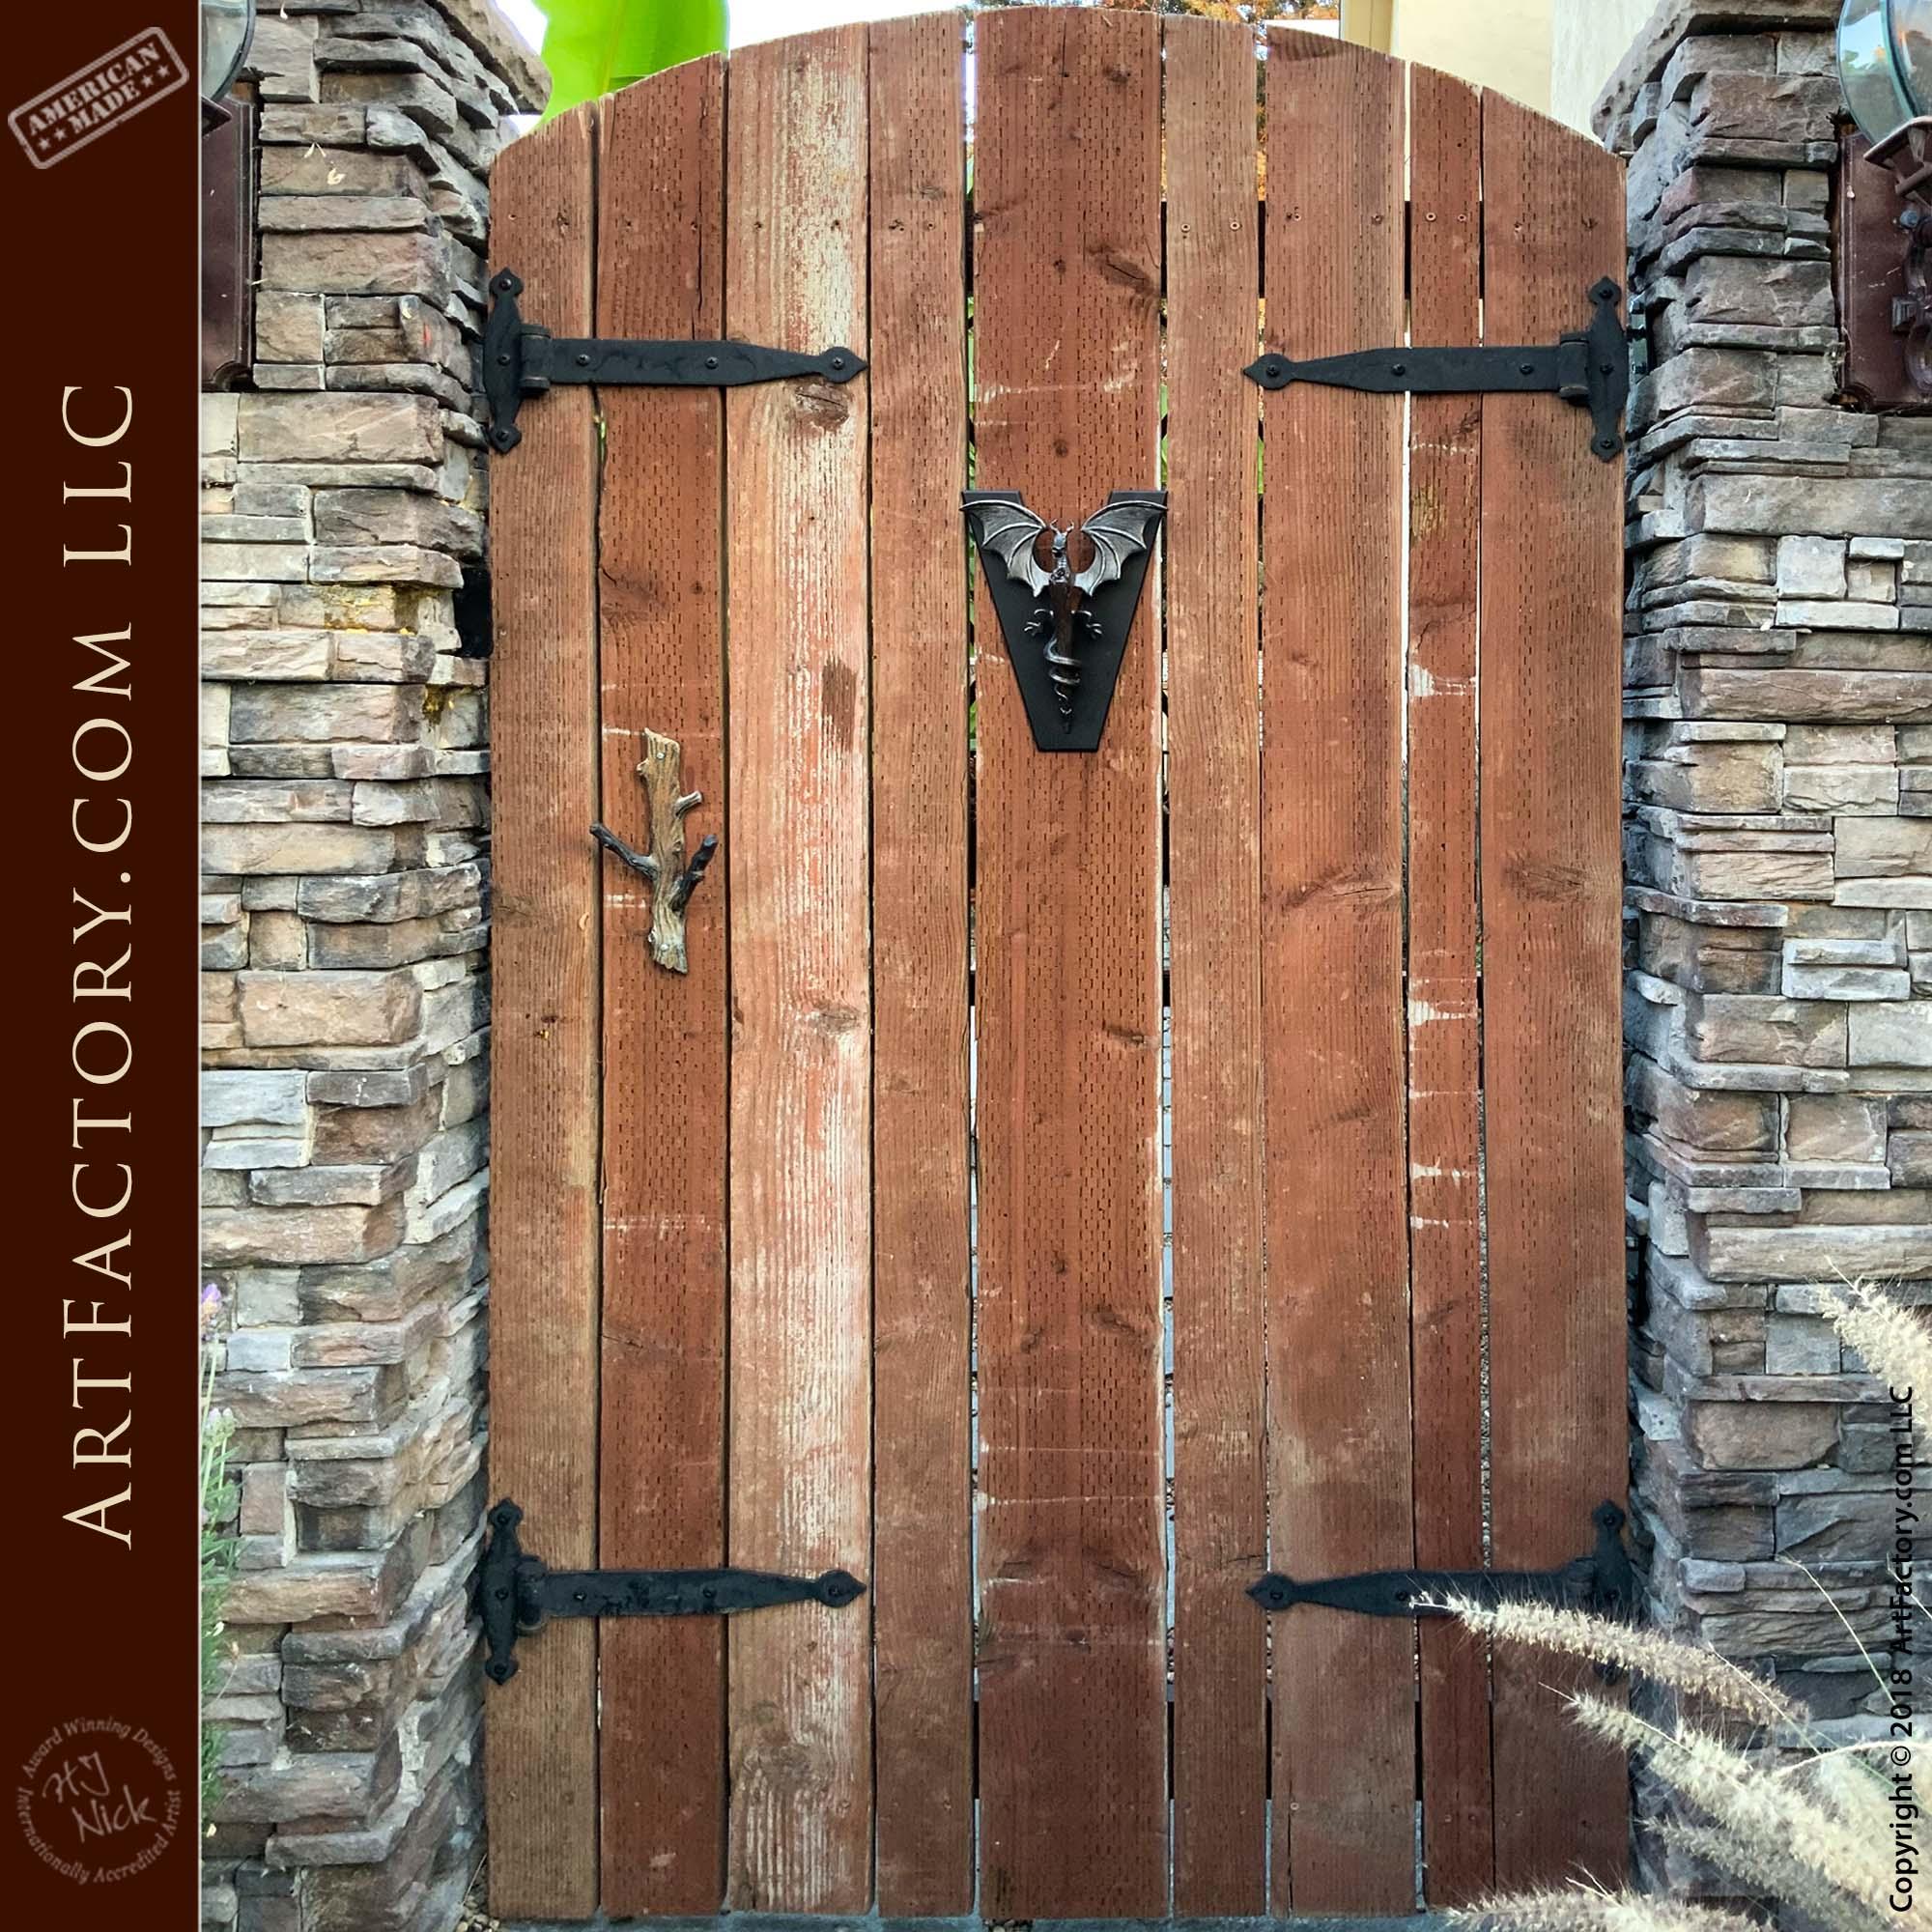 Custom Dragon Door Knocker: Blacksmith Hand Forged Fine Art Hardware